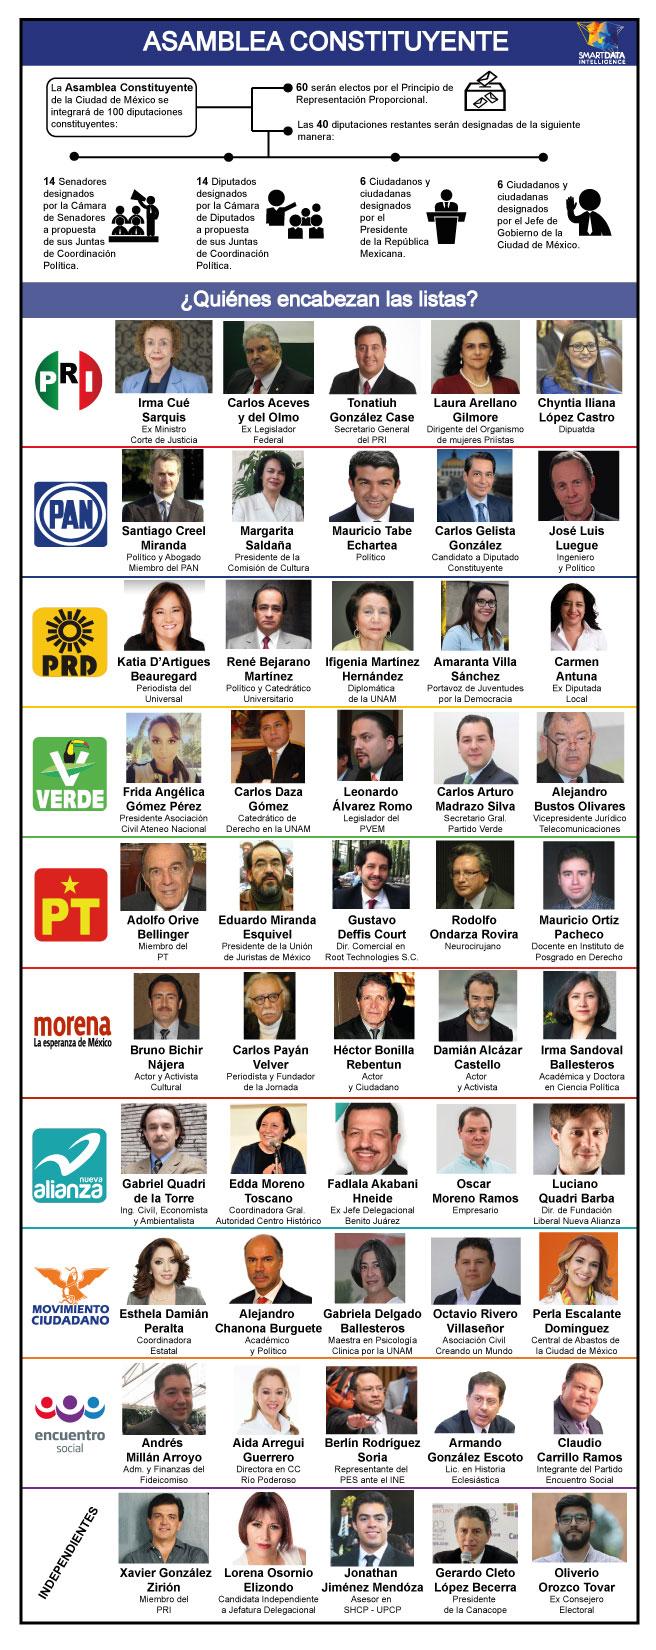 Asamblea-Constituyente-CDMX.jpg